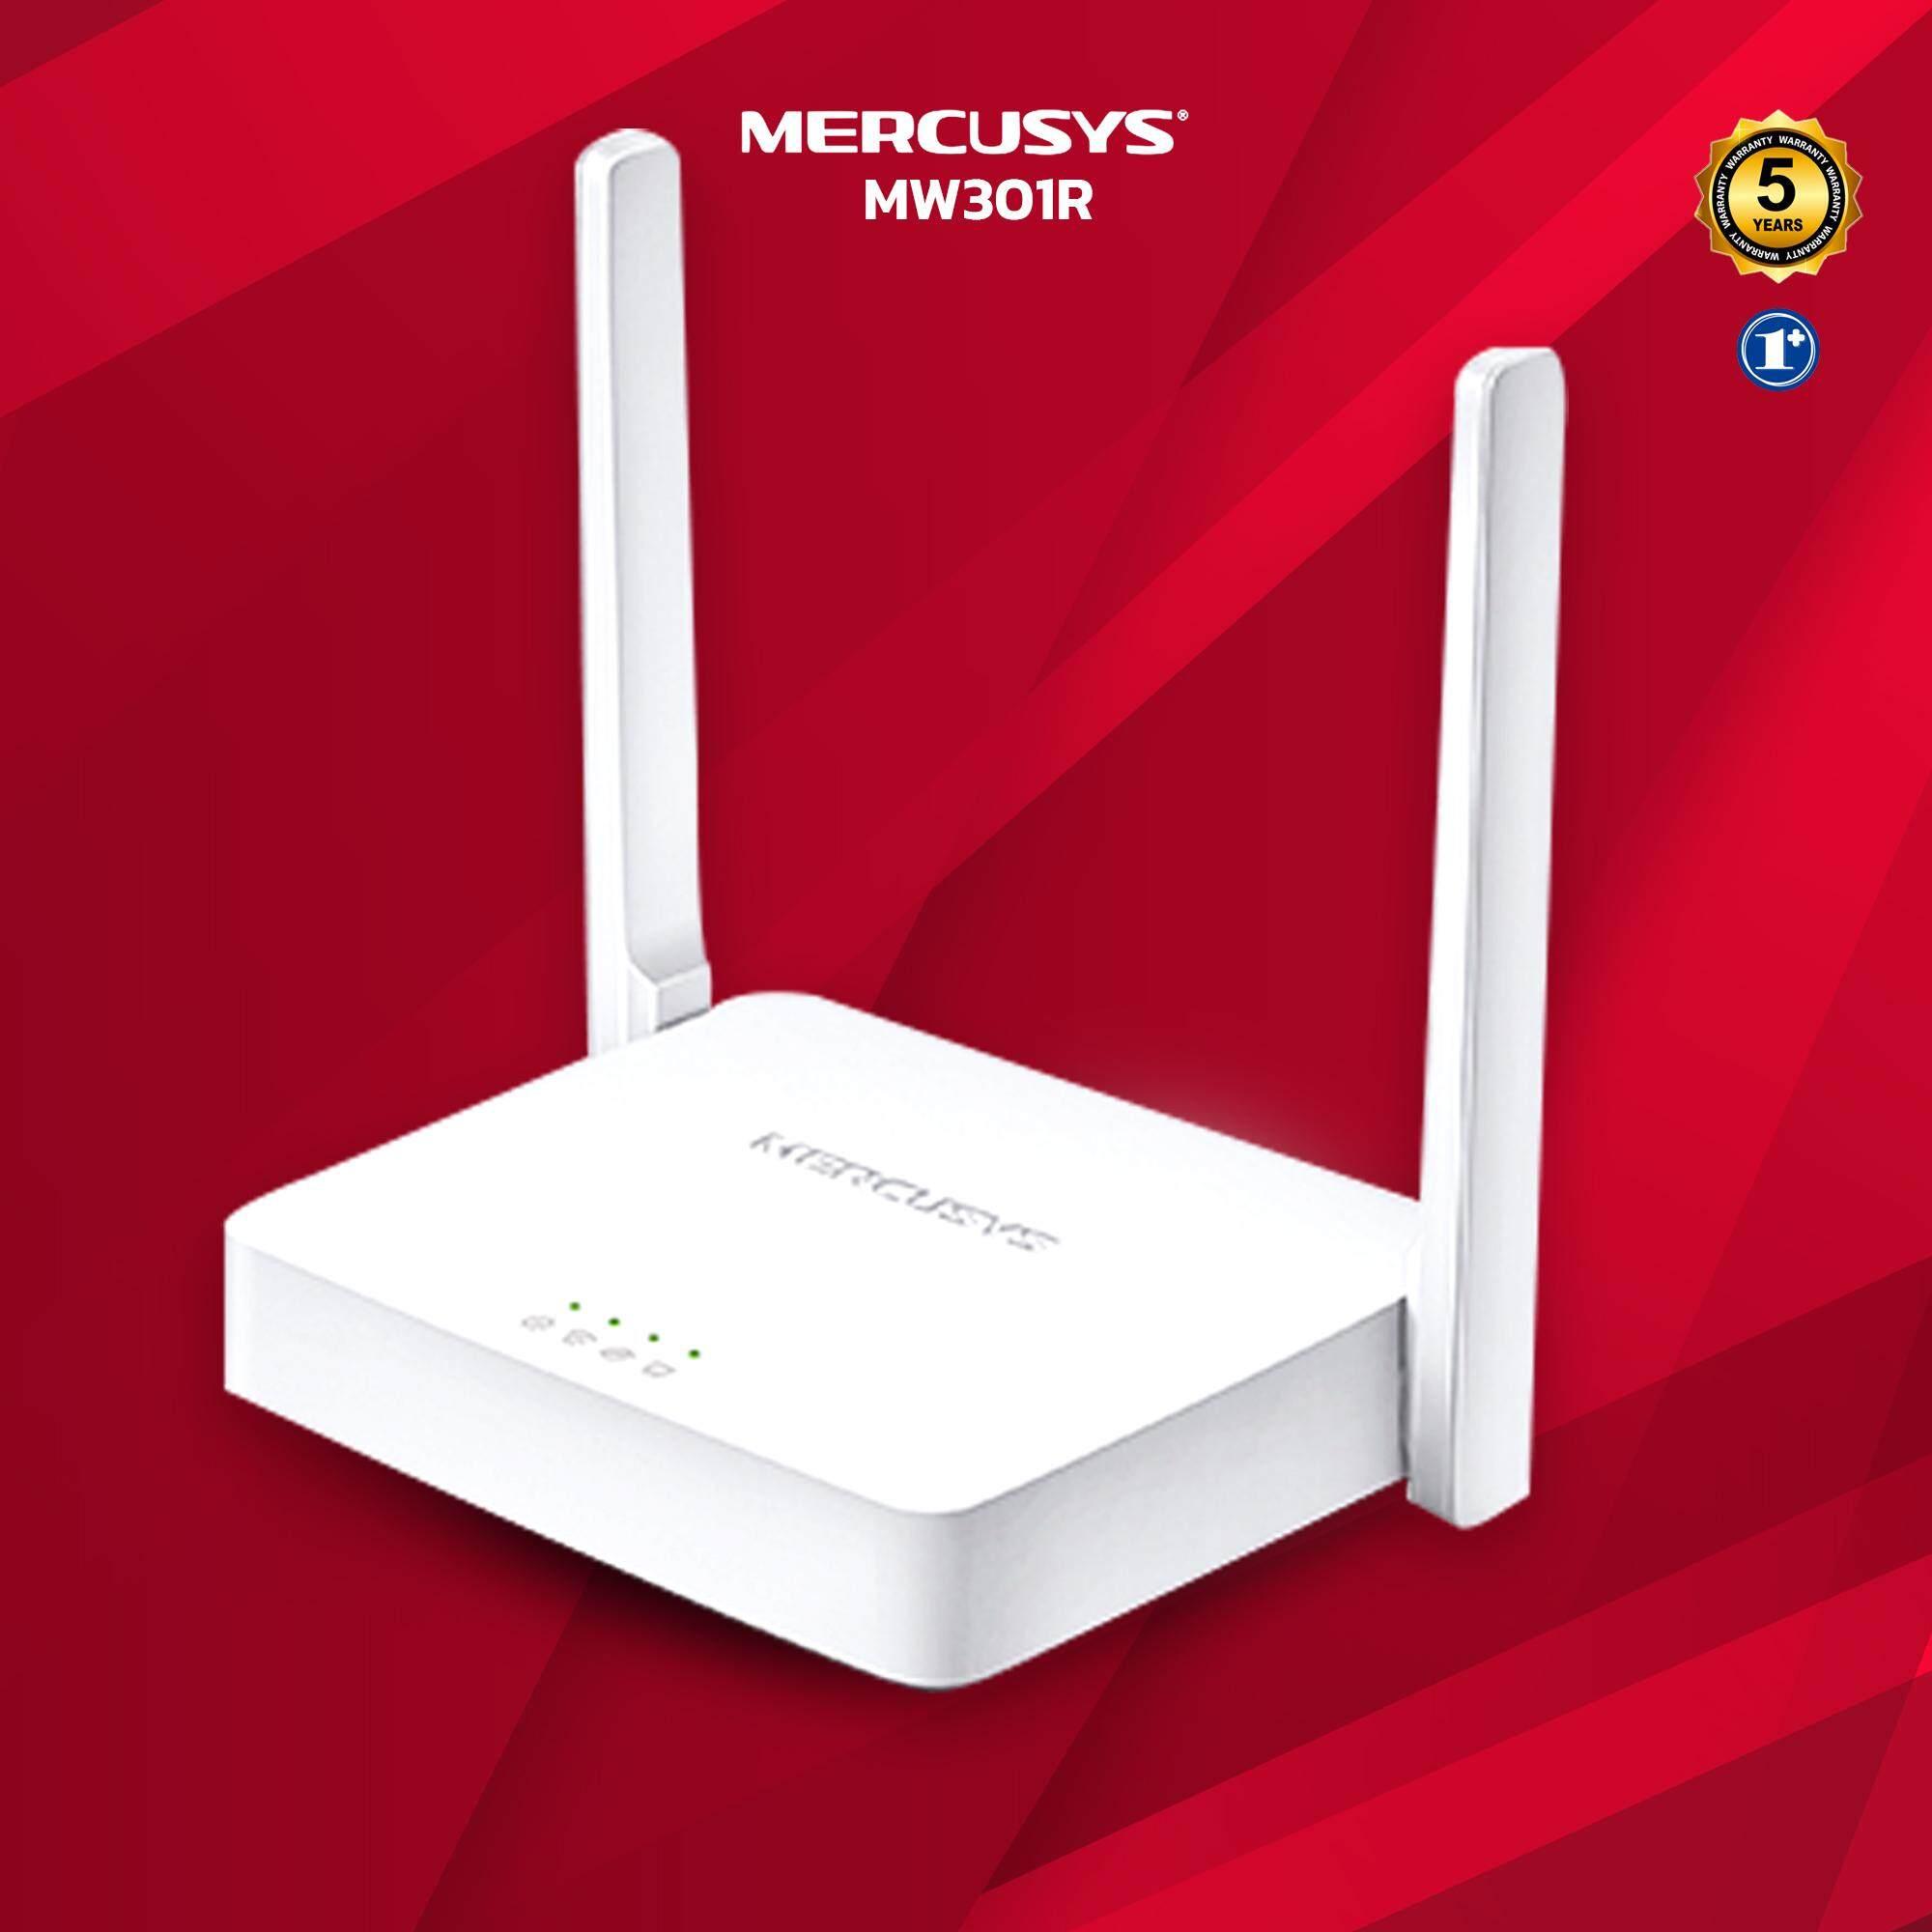 Mercusys Mw301r ไวเรสเราเตอร์สำหรับบ้านหรือองค์กรขนาดเล็ก 300mbps Wireless N Router.